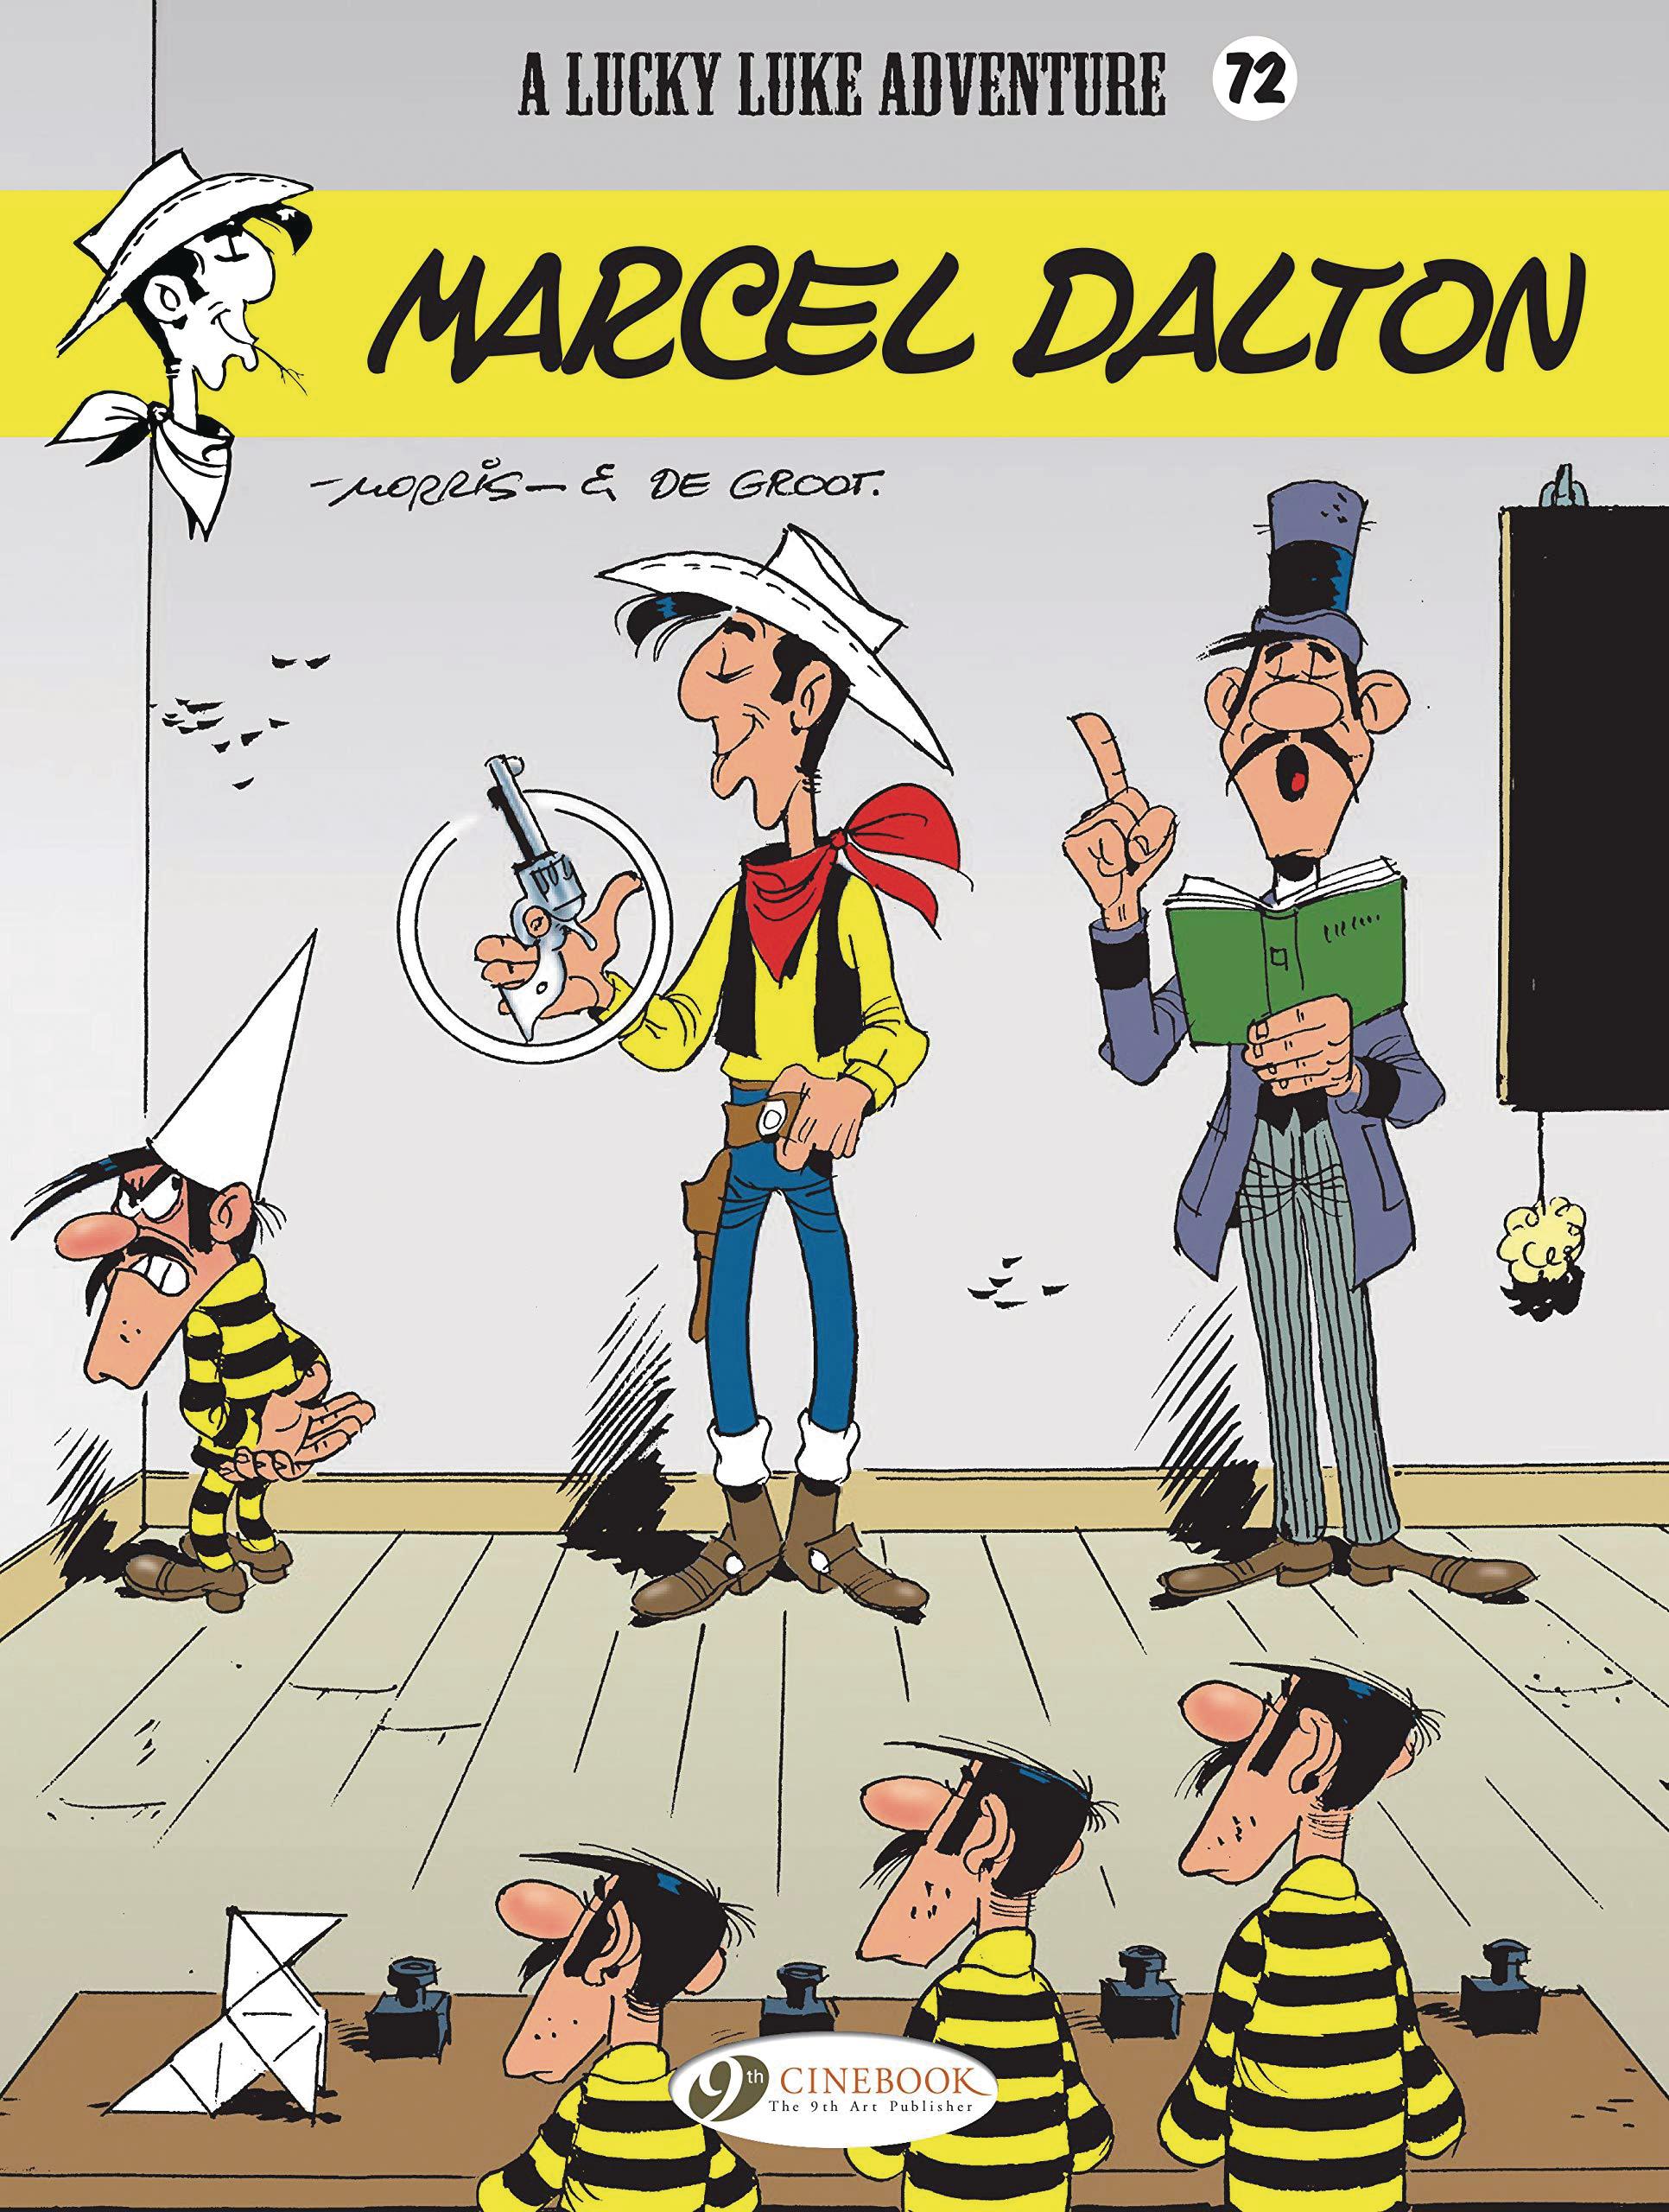 LUCKY LUKE TP VOL 72 MARCEL DALTON